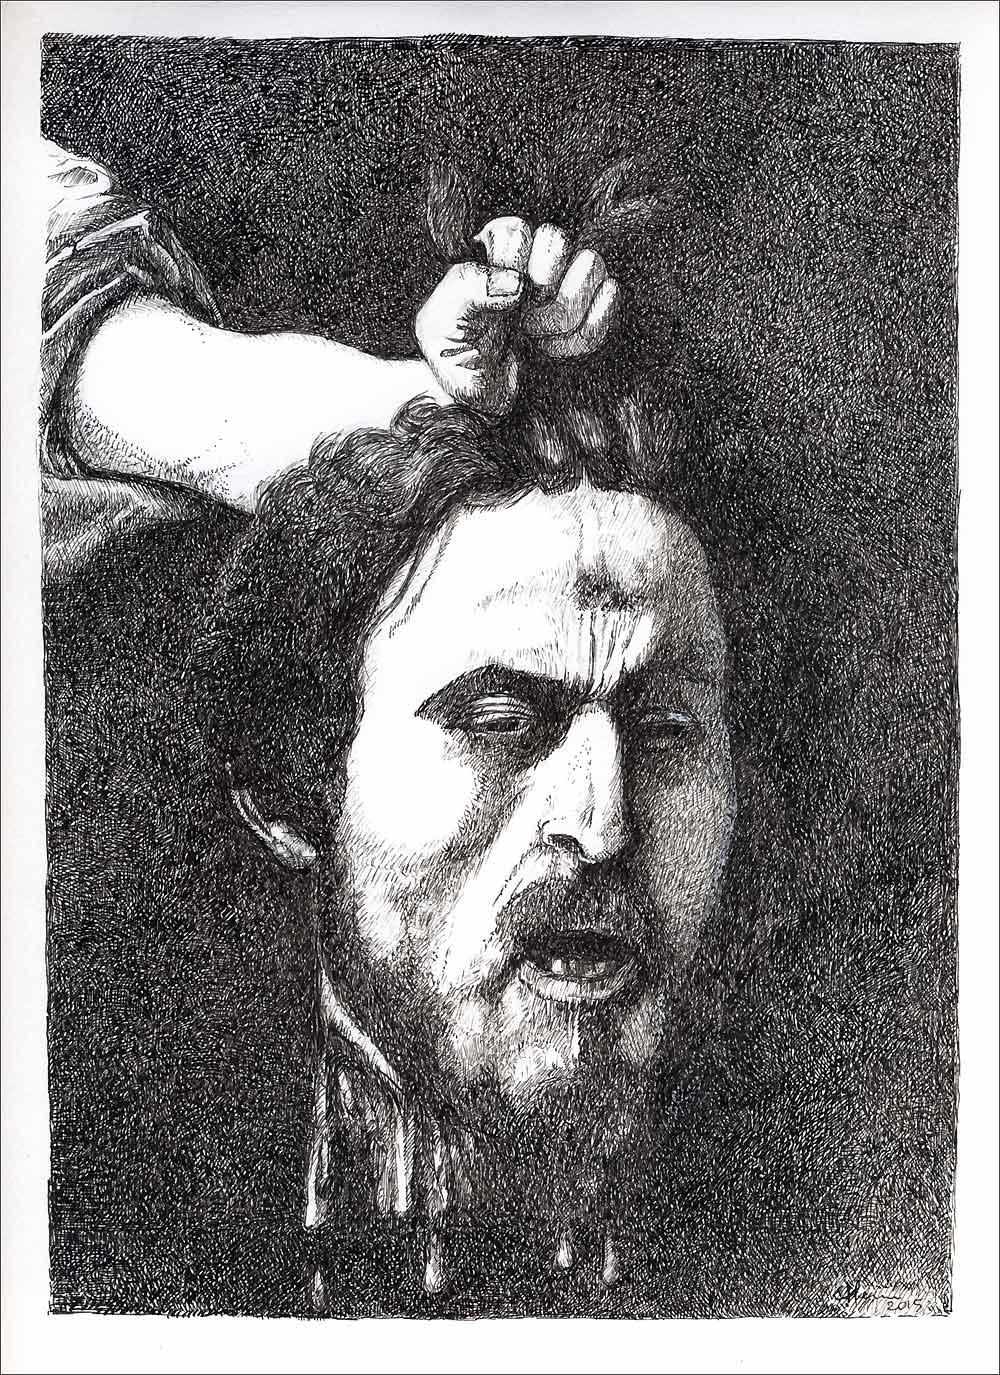 Henri Blanc dessins à la plume - Caravage daesh ink drawing